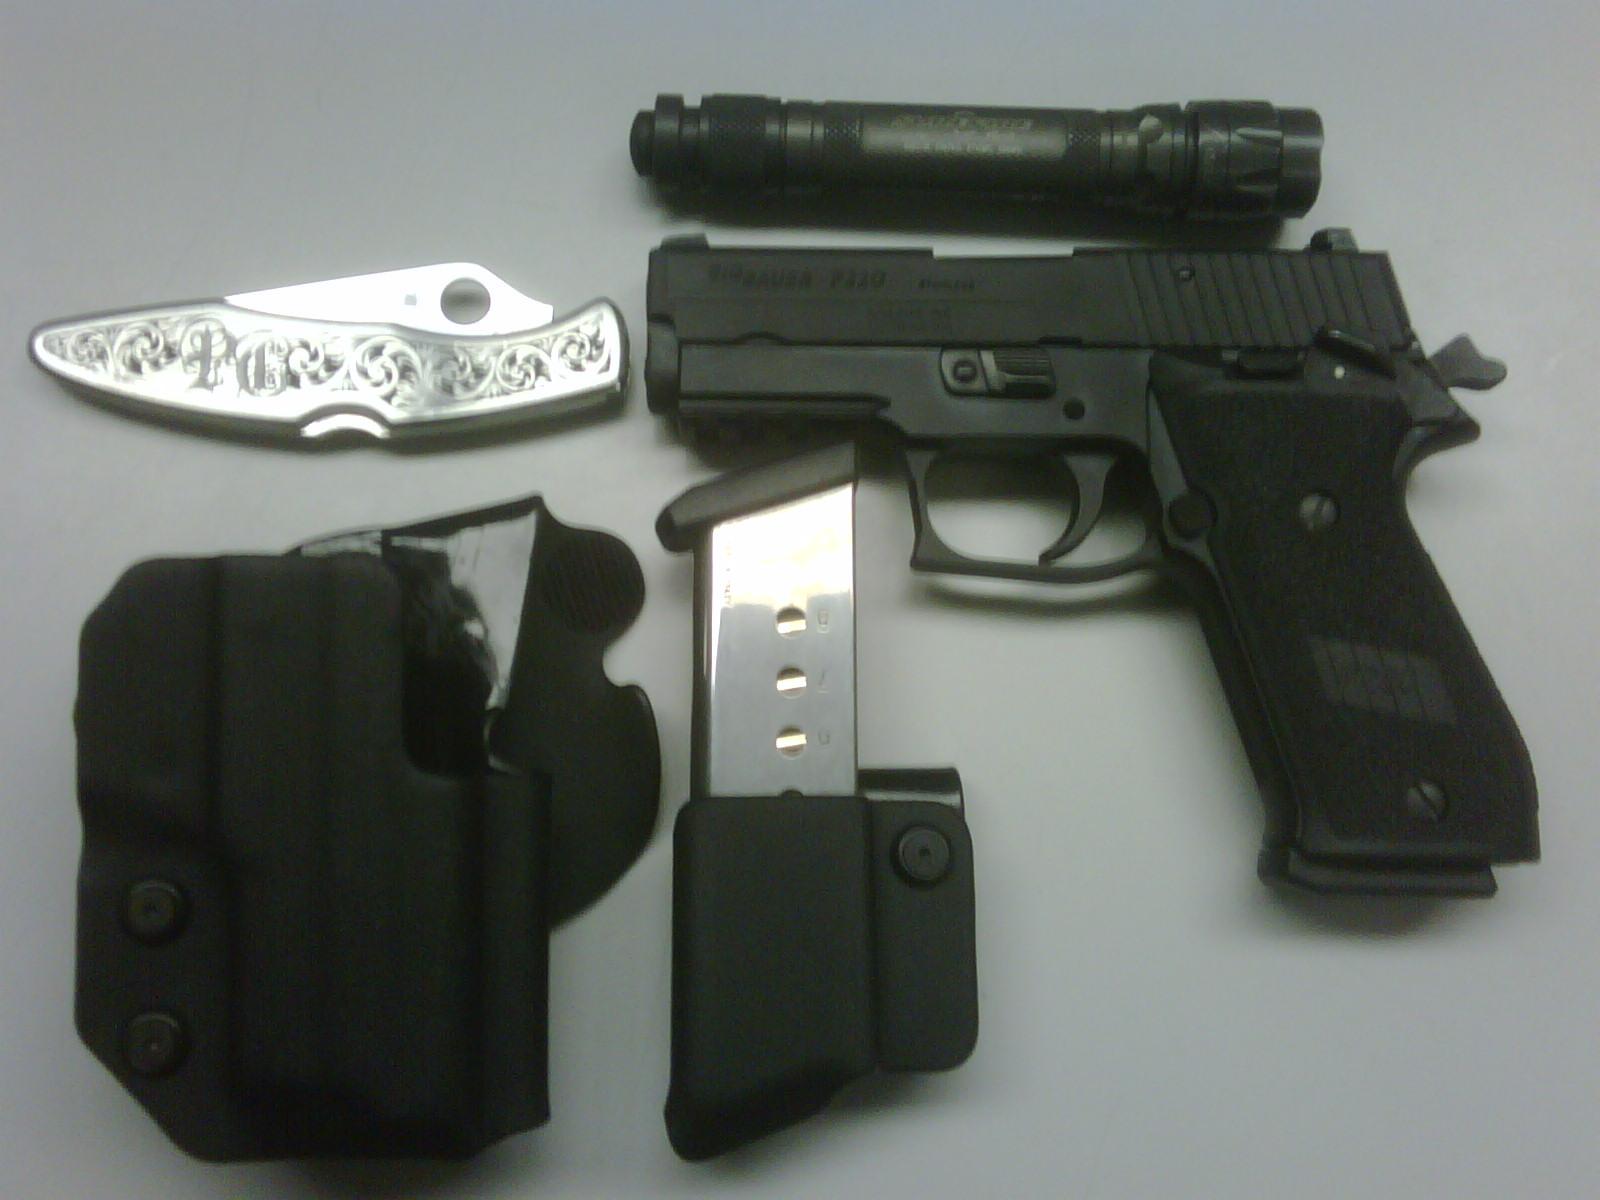 Pics of my SIG P220 SAO in Comp-Tac-img00153-20090227-2323.jpg